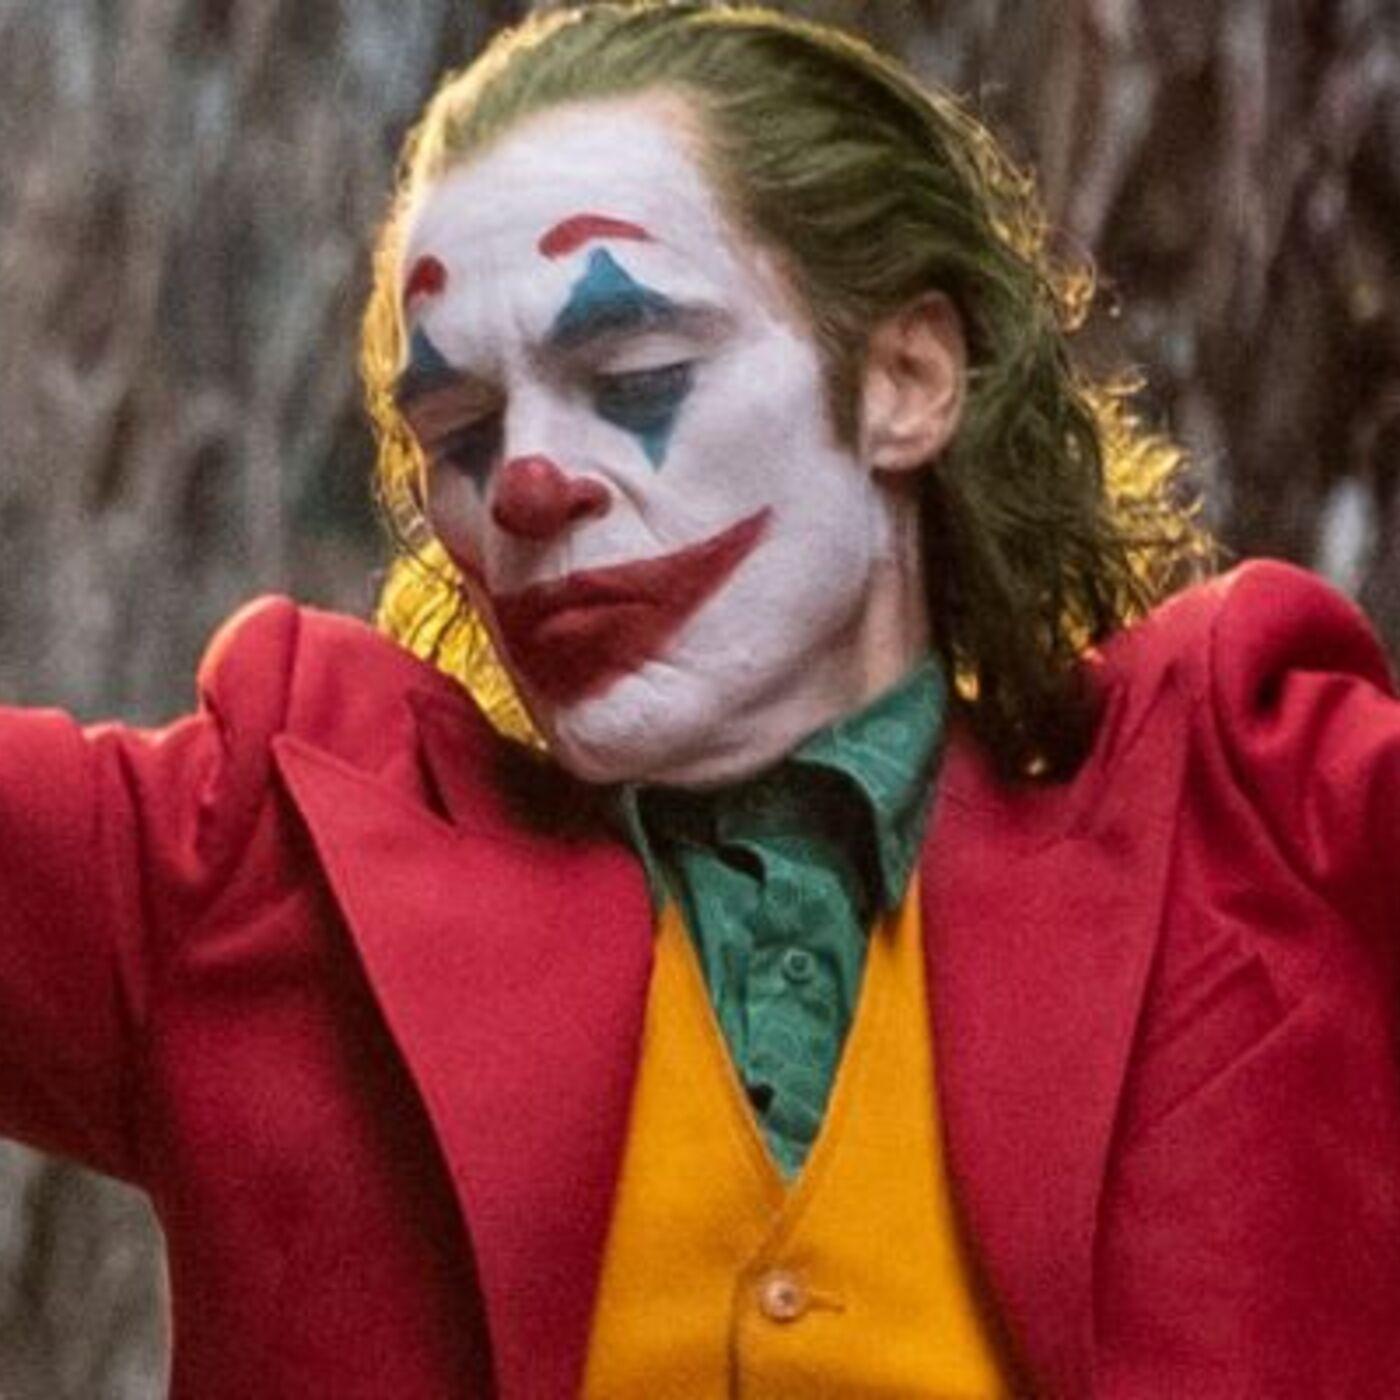 Episode 32 - Joker and Gemini Man